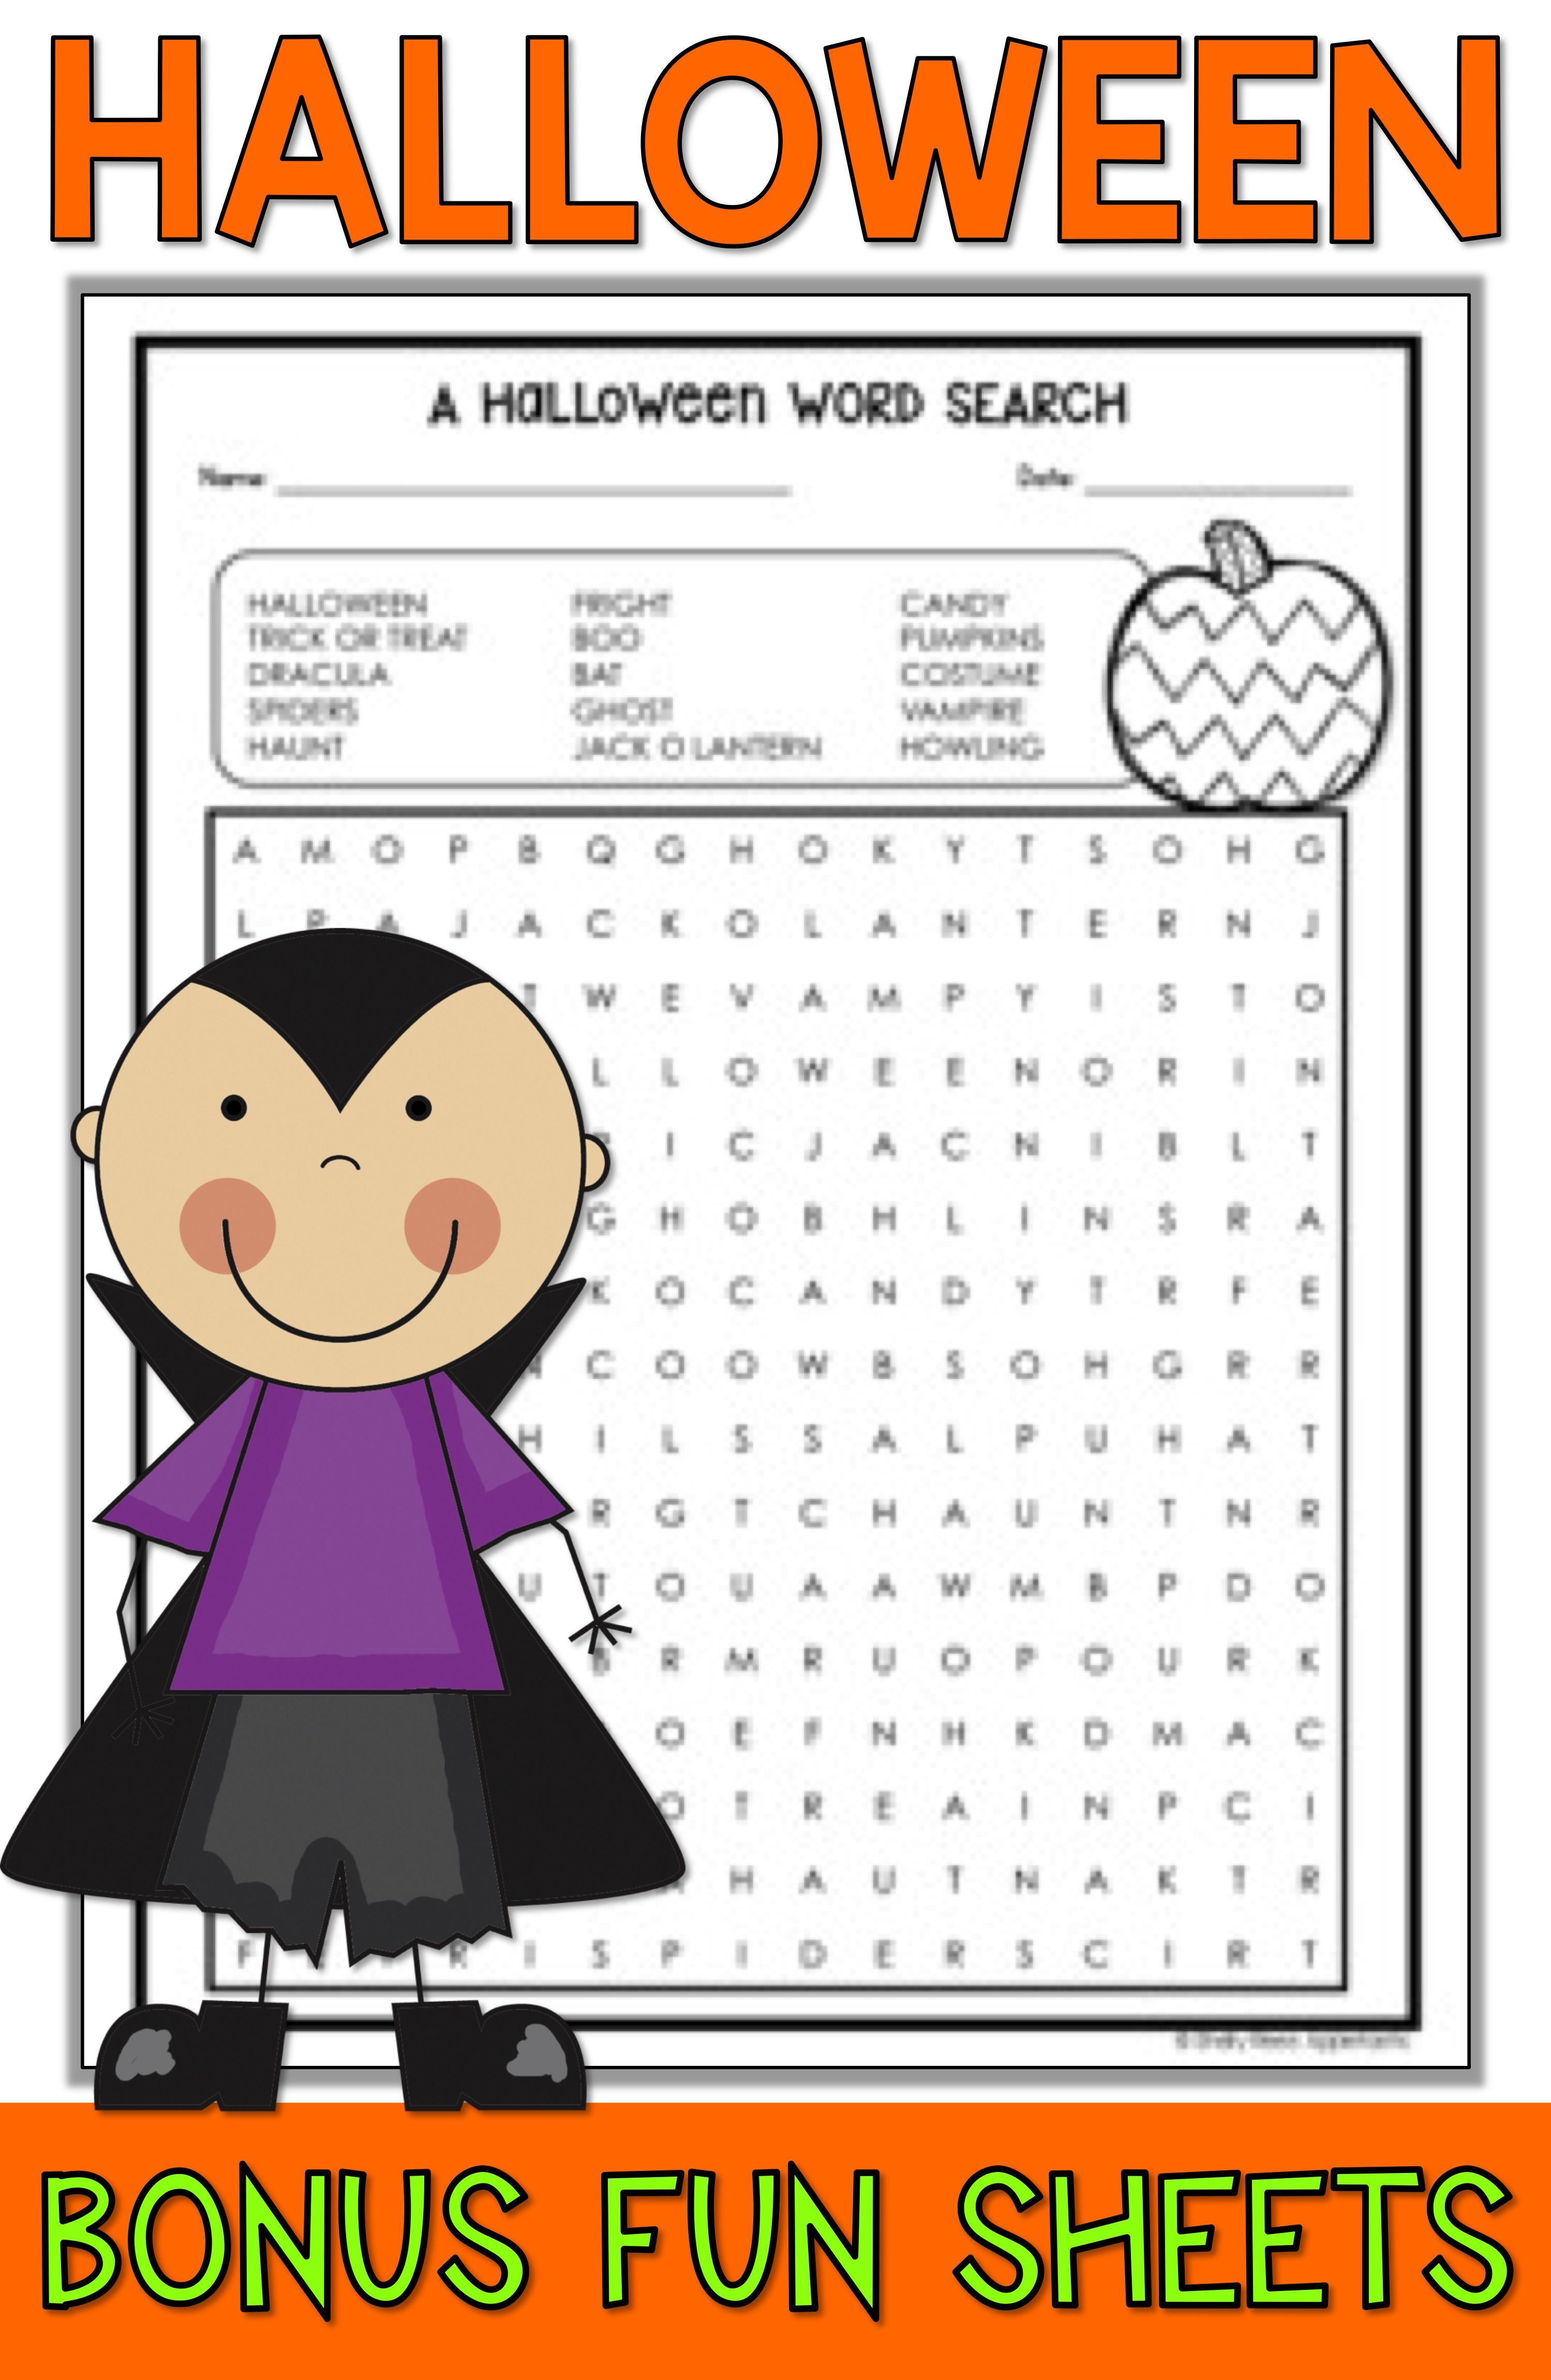 Https Www Teacherspayteachers Com Product Halloween Reading Packet Halloween Halloween Reading Comprehension Reading Comprehension Passages Halloween Reading [ 4599 x 2998 Pixel ]